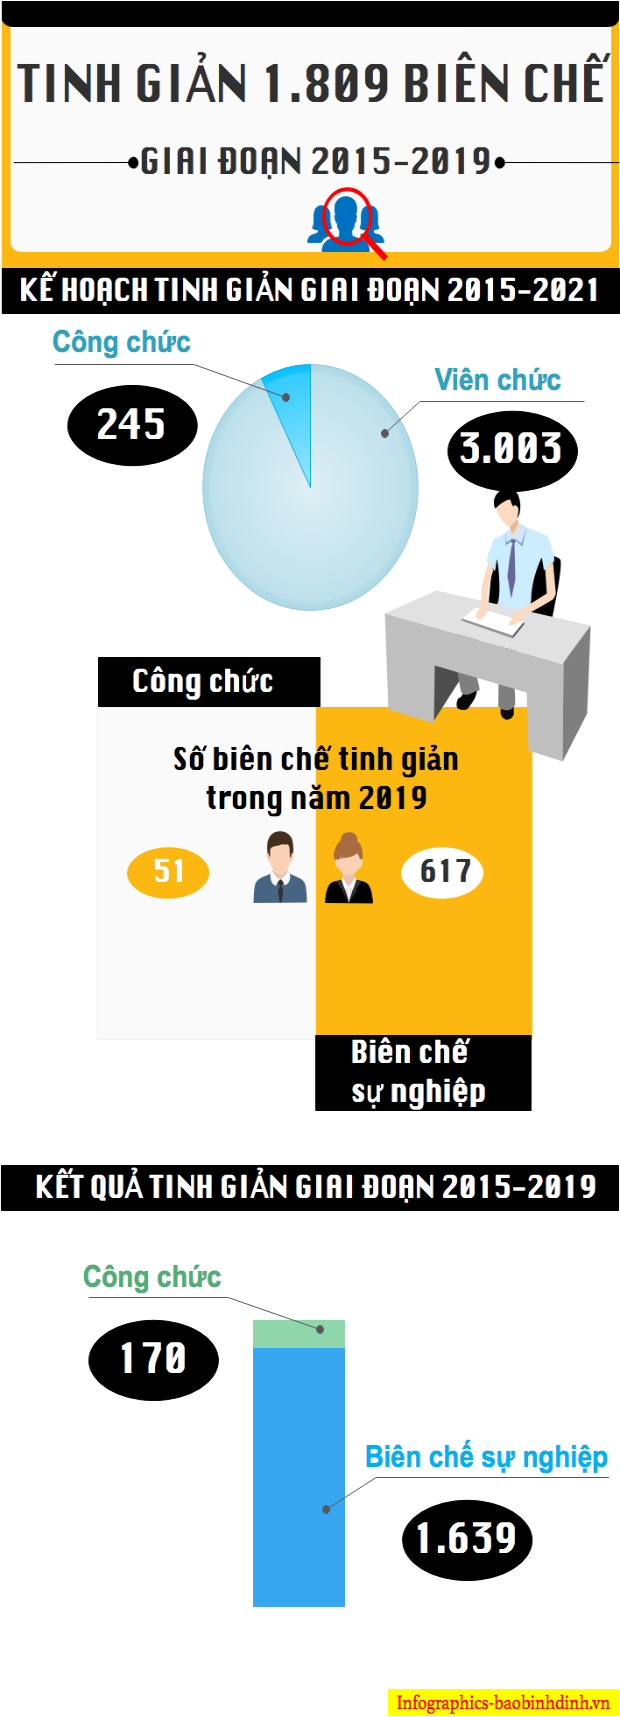 Bien-che-20-1